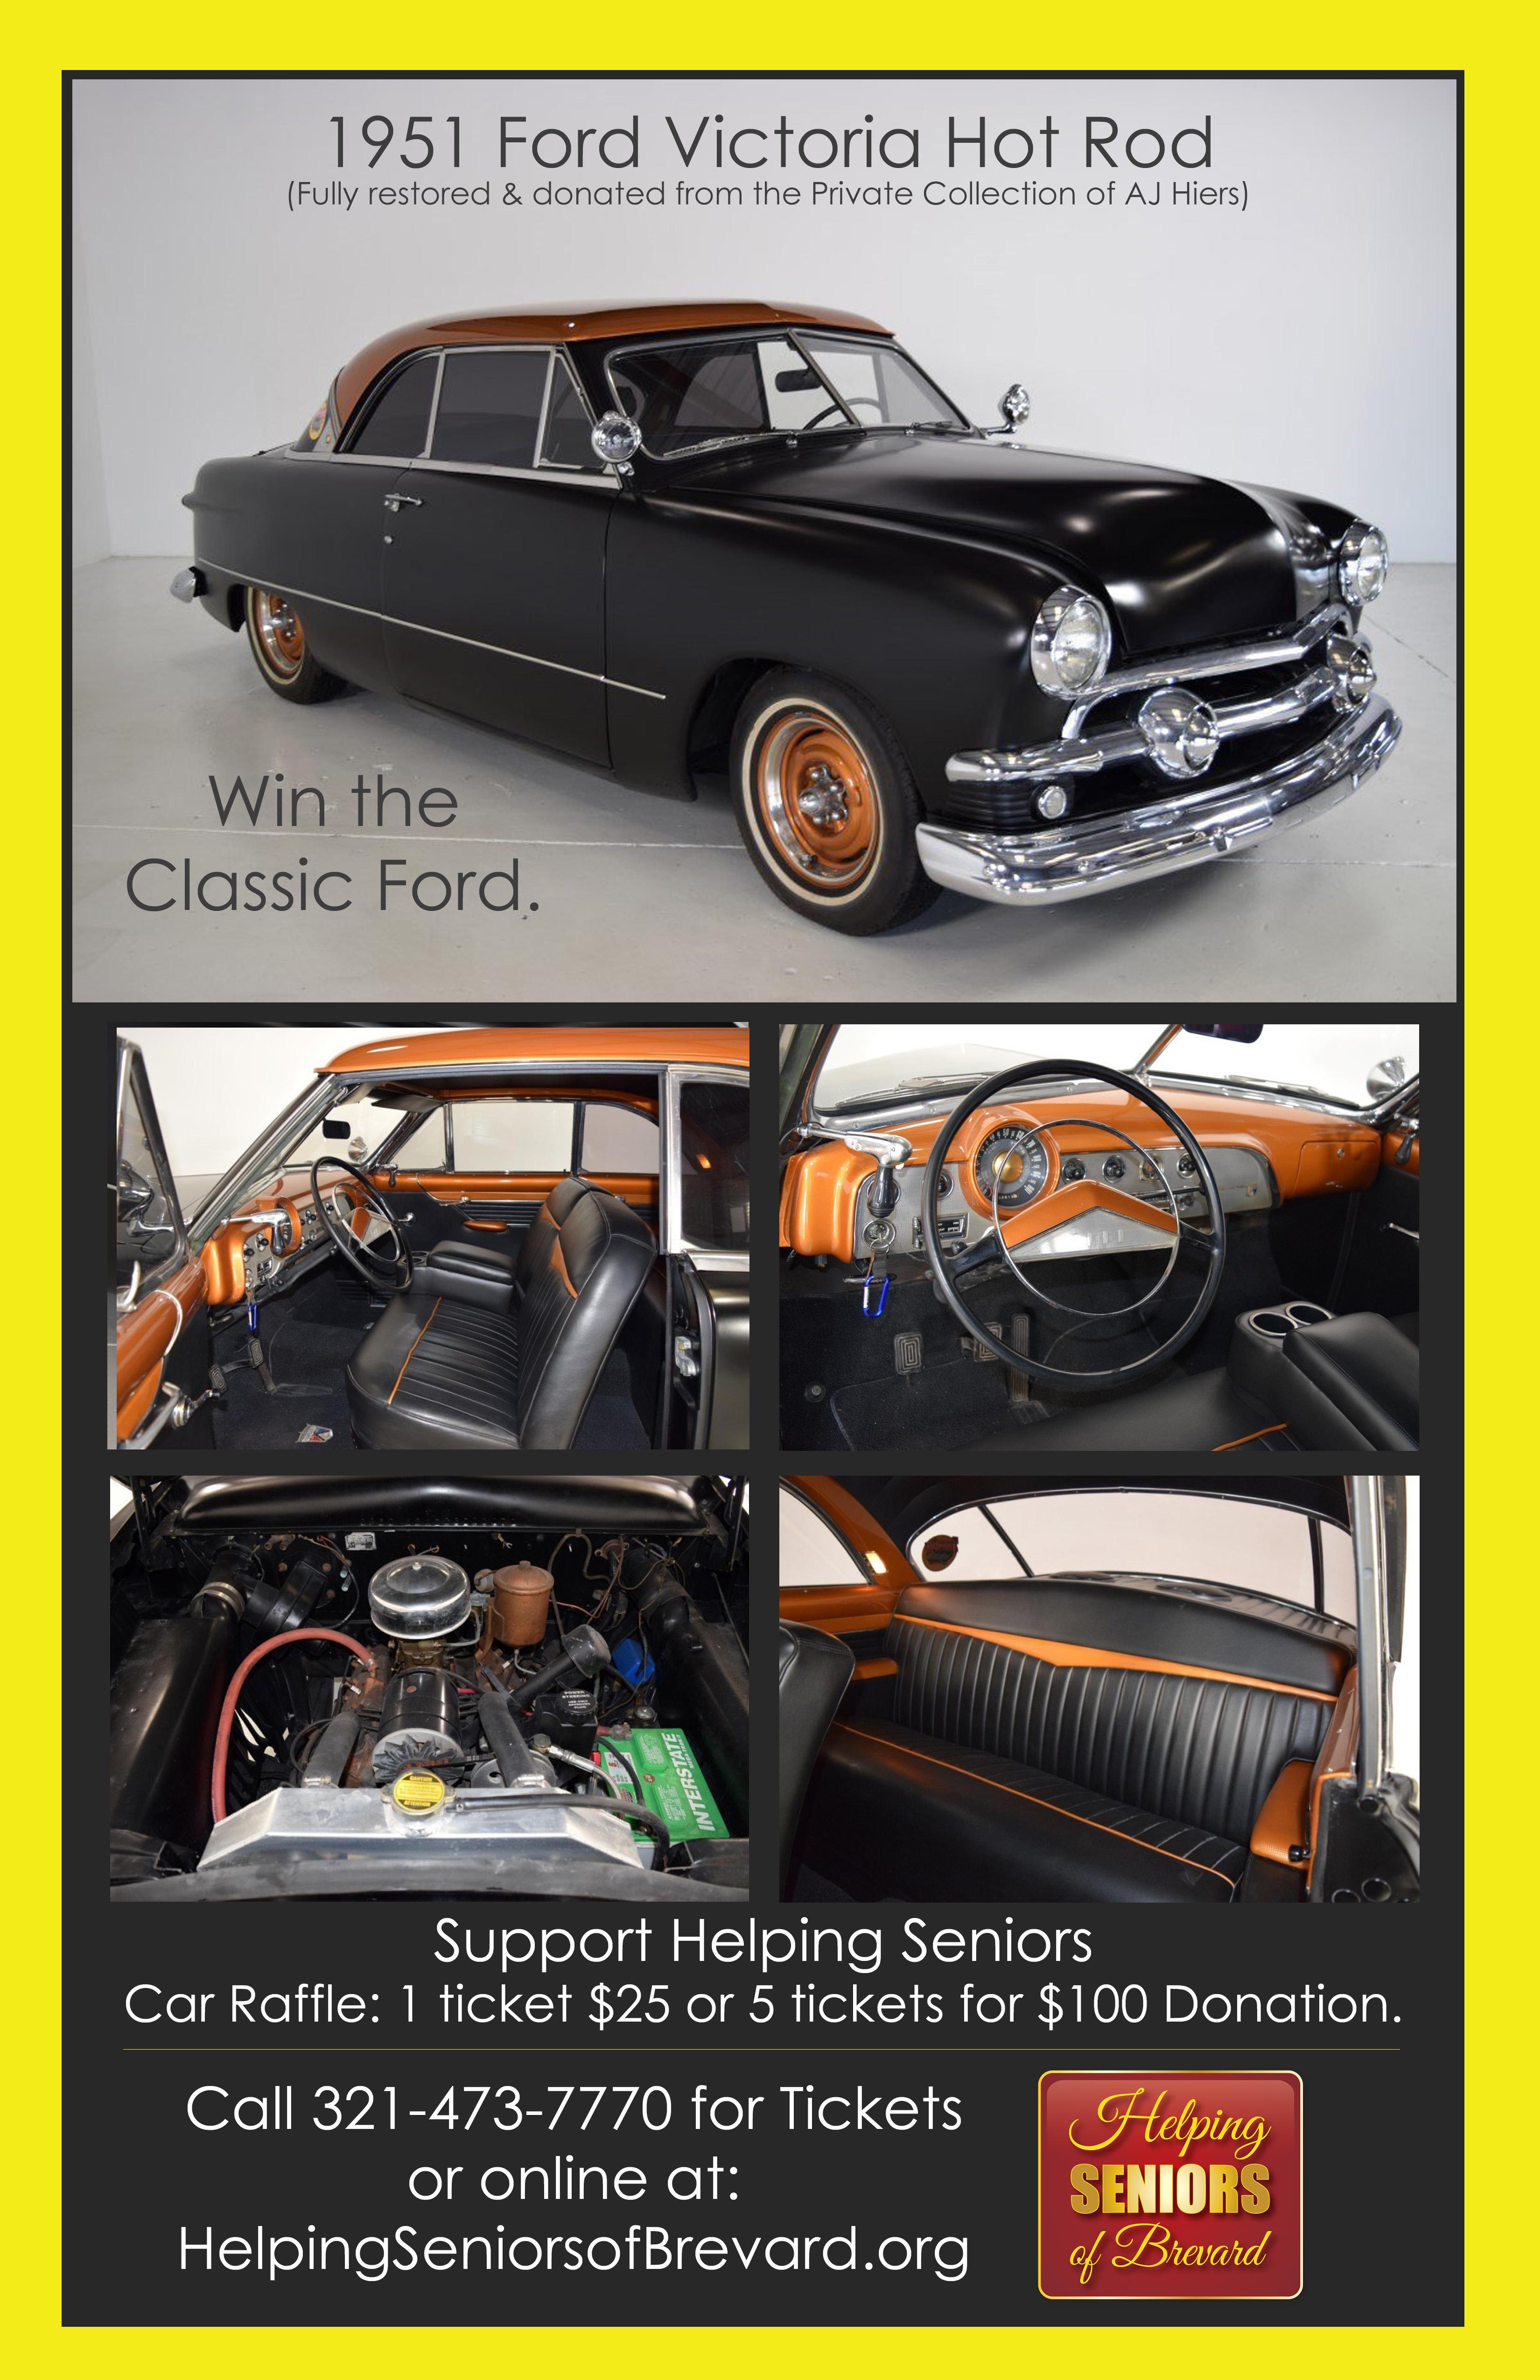 Helping-Seniors-Car-Raffle-Poster